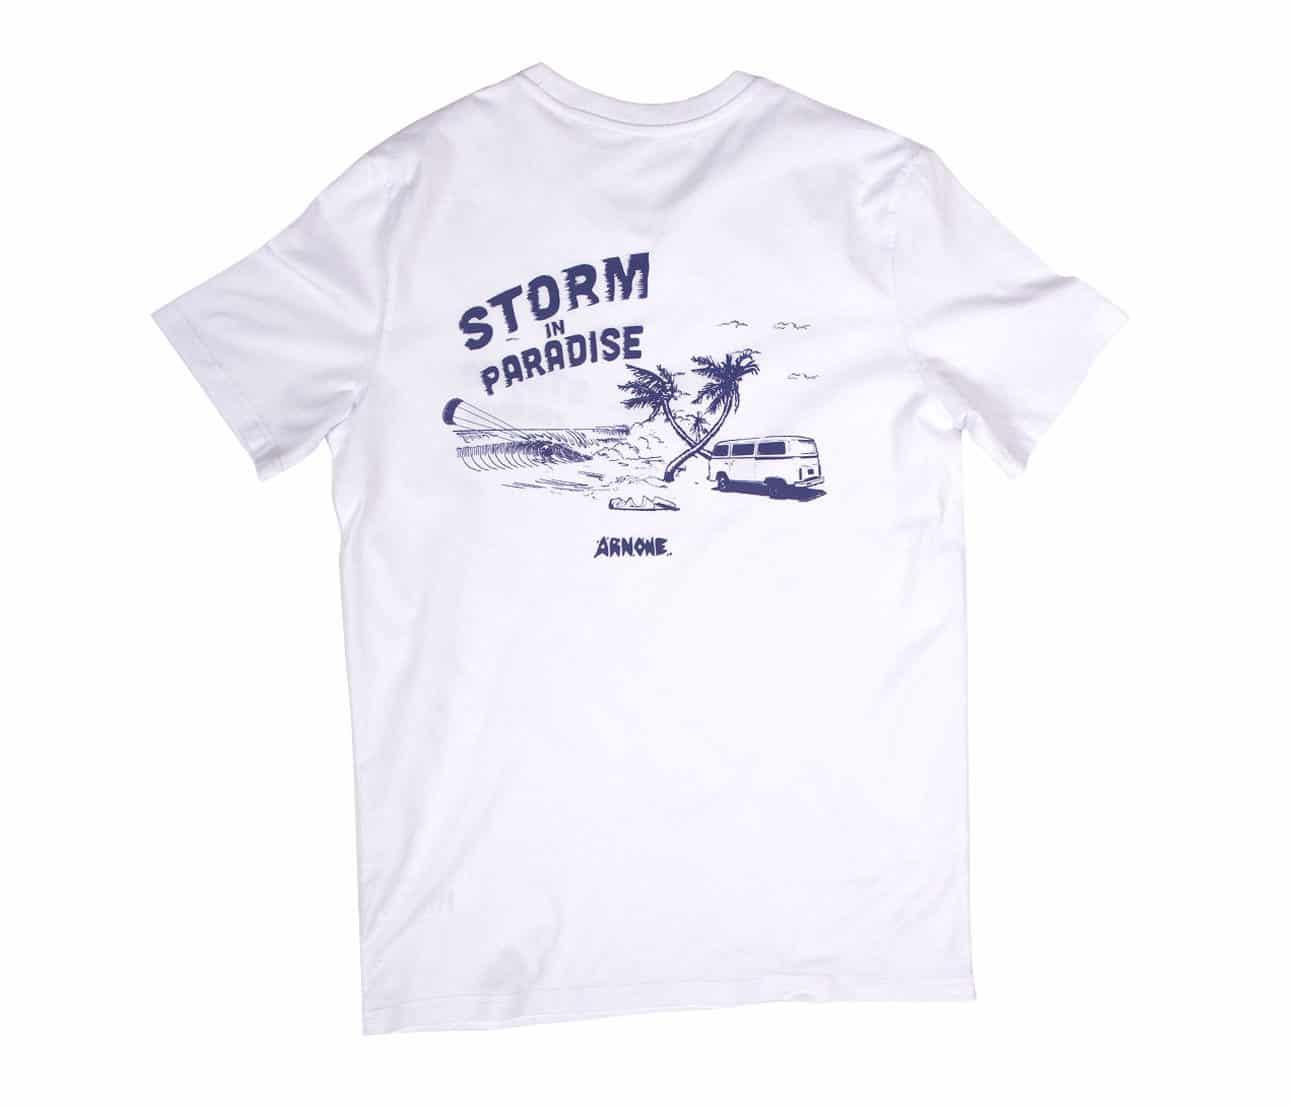 Storm in paradise kitesurf